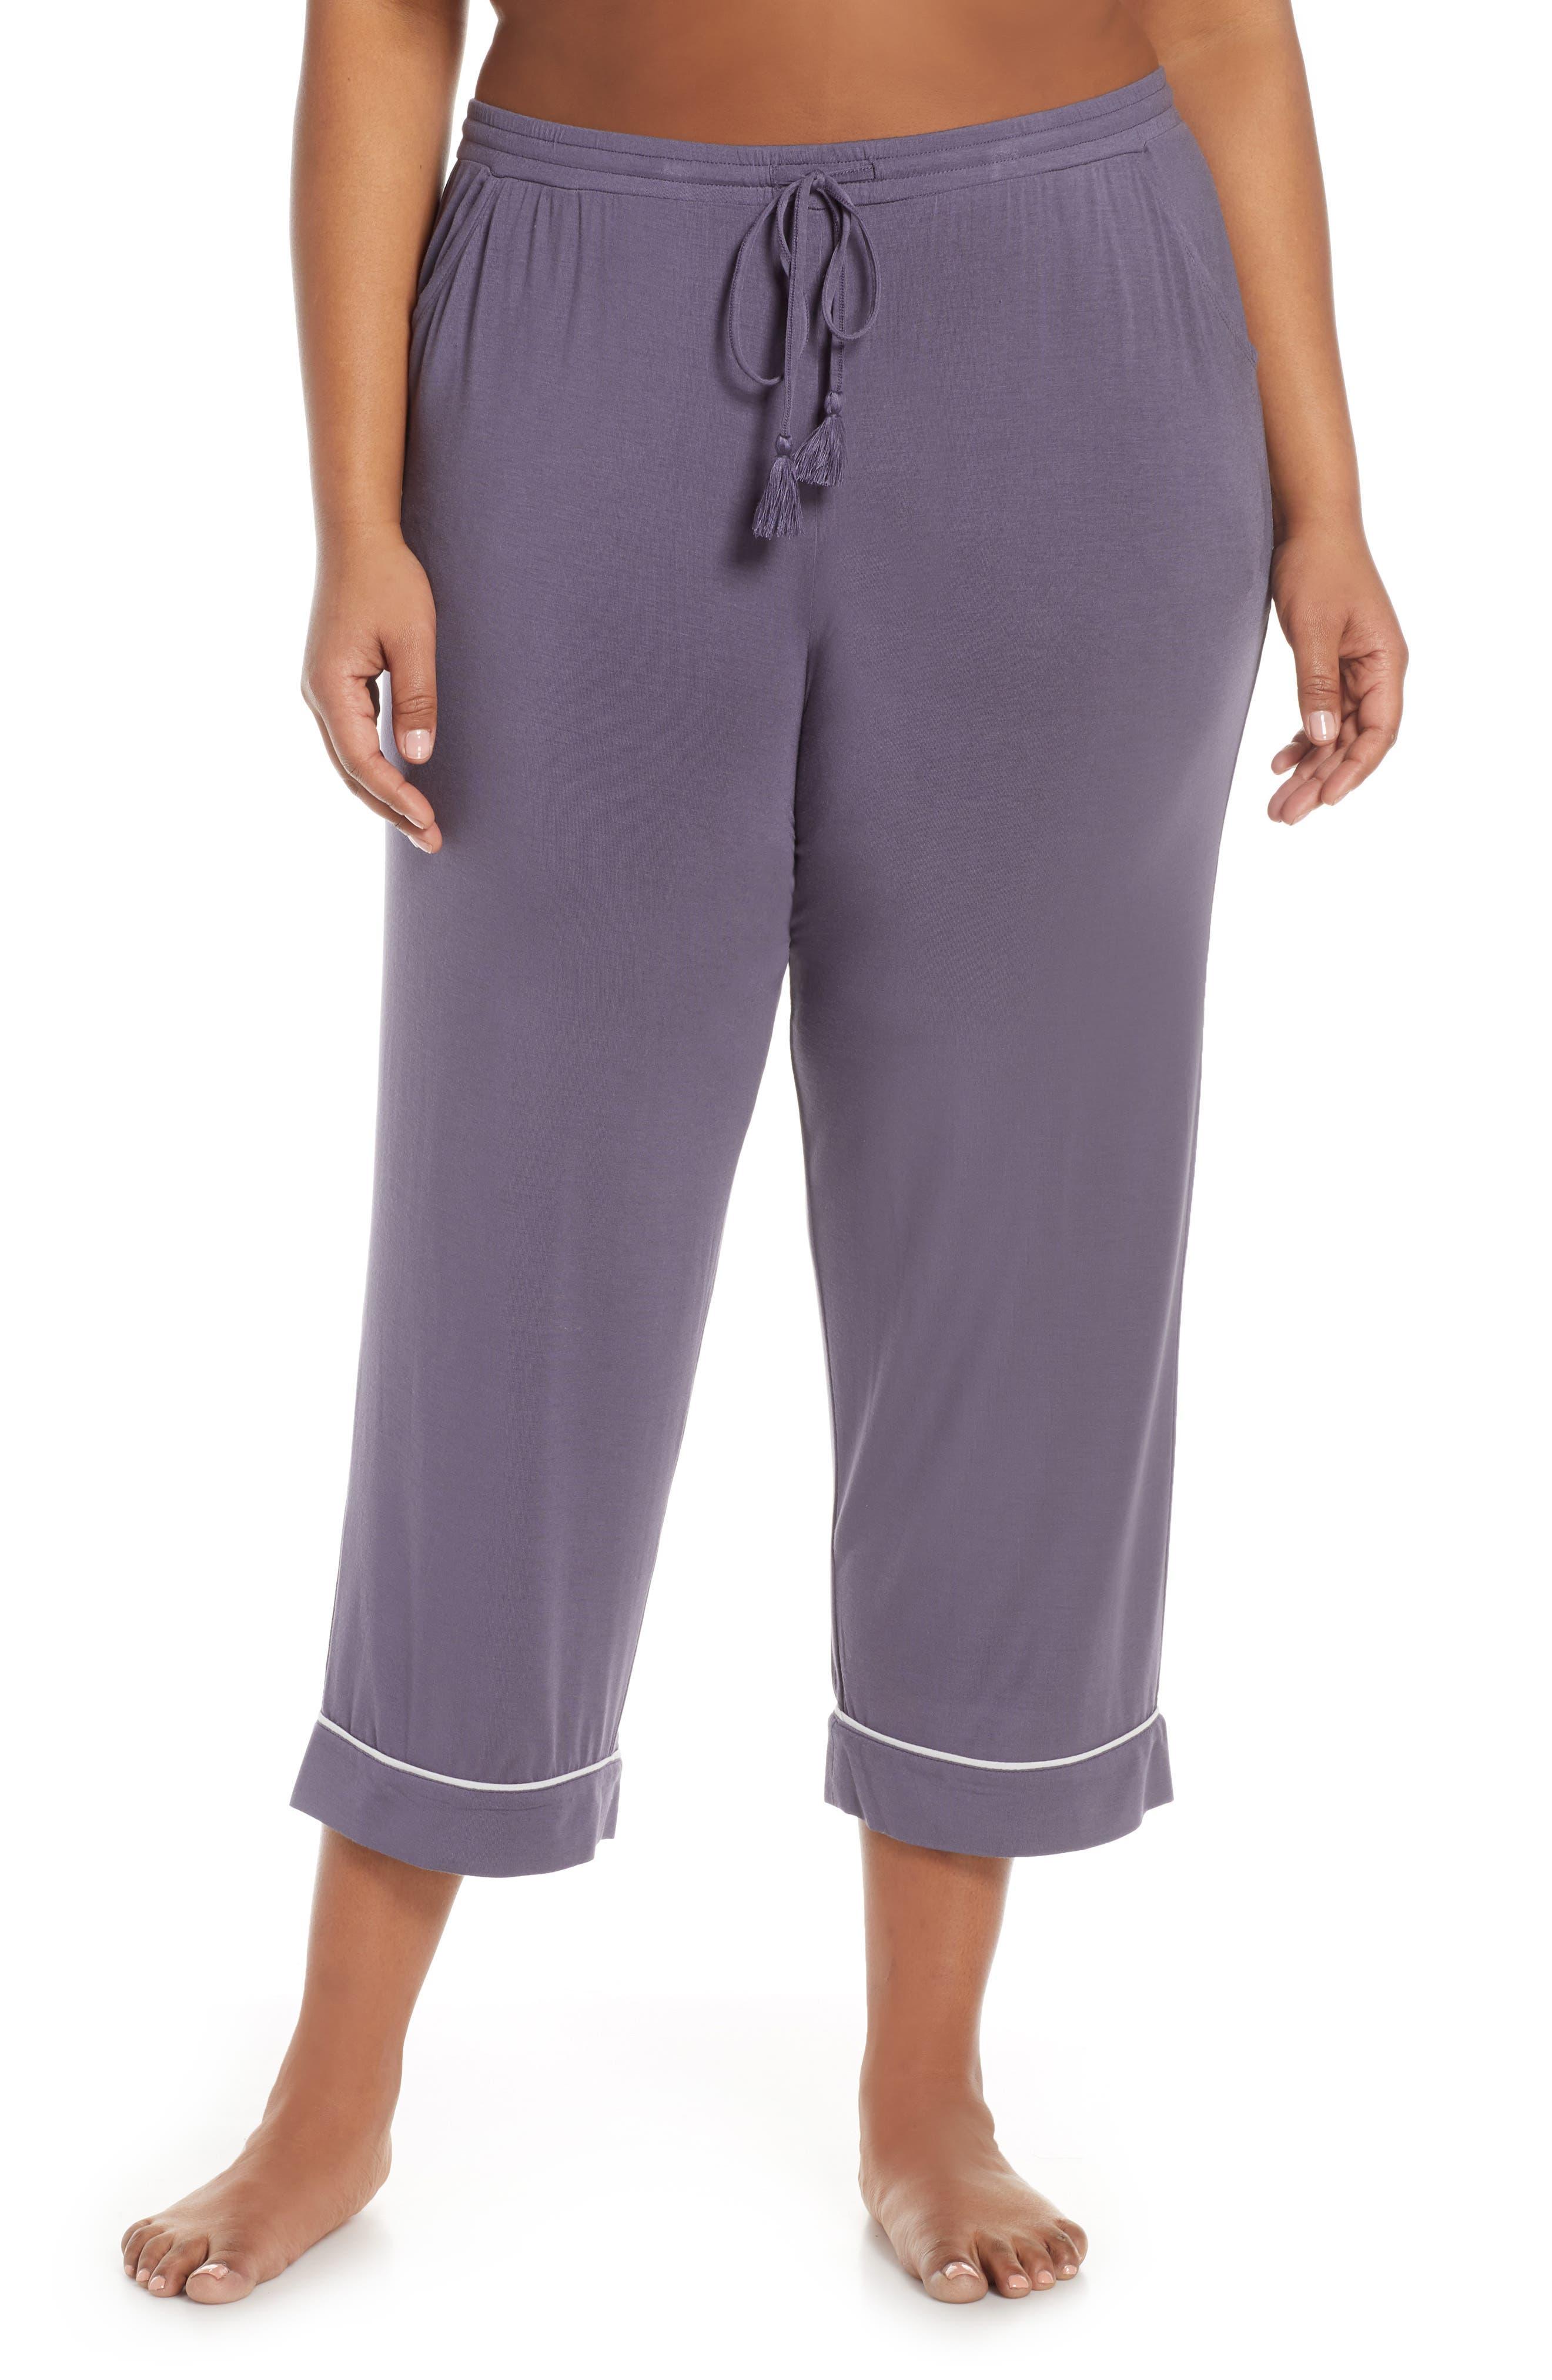 Plus Size Nordstrom Lingerie Moonlight Crop Pajama Pants, Grey